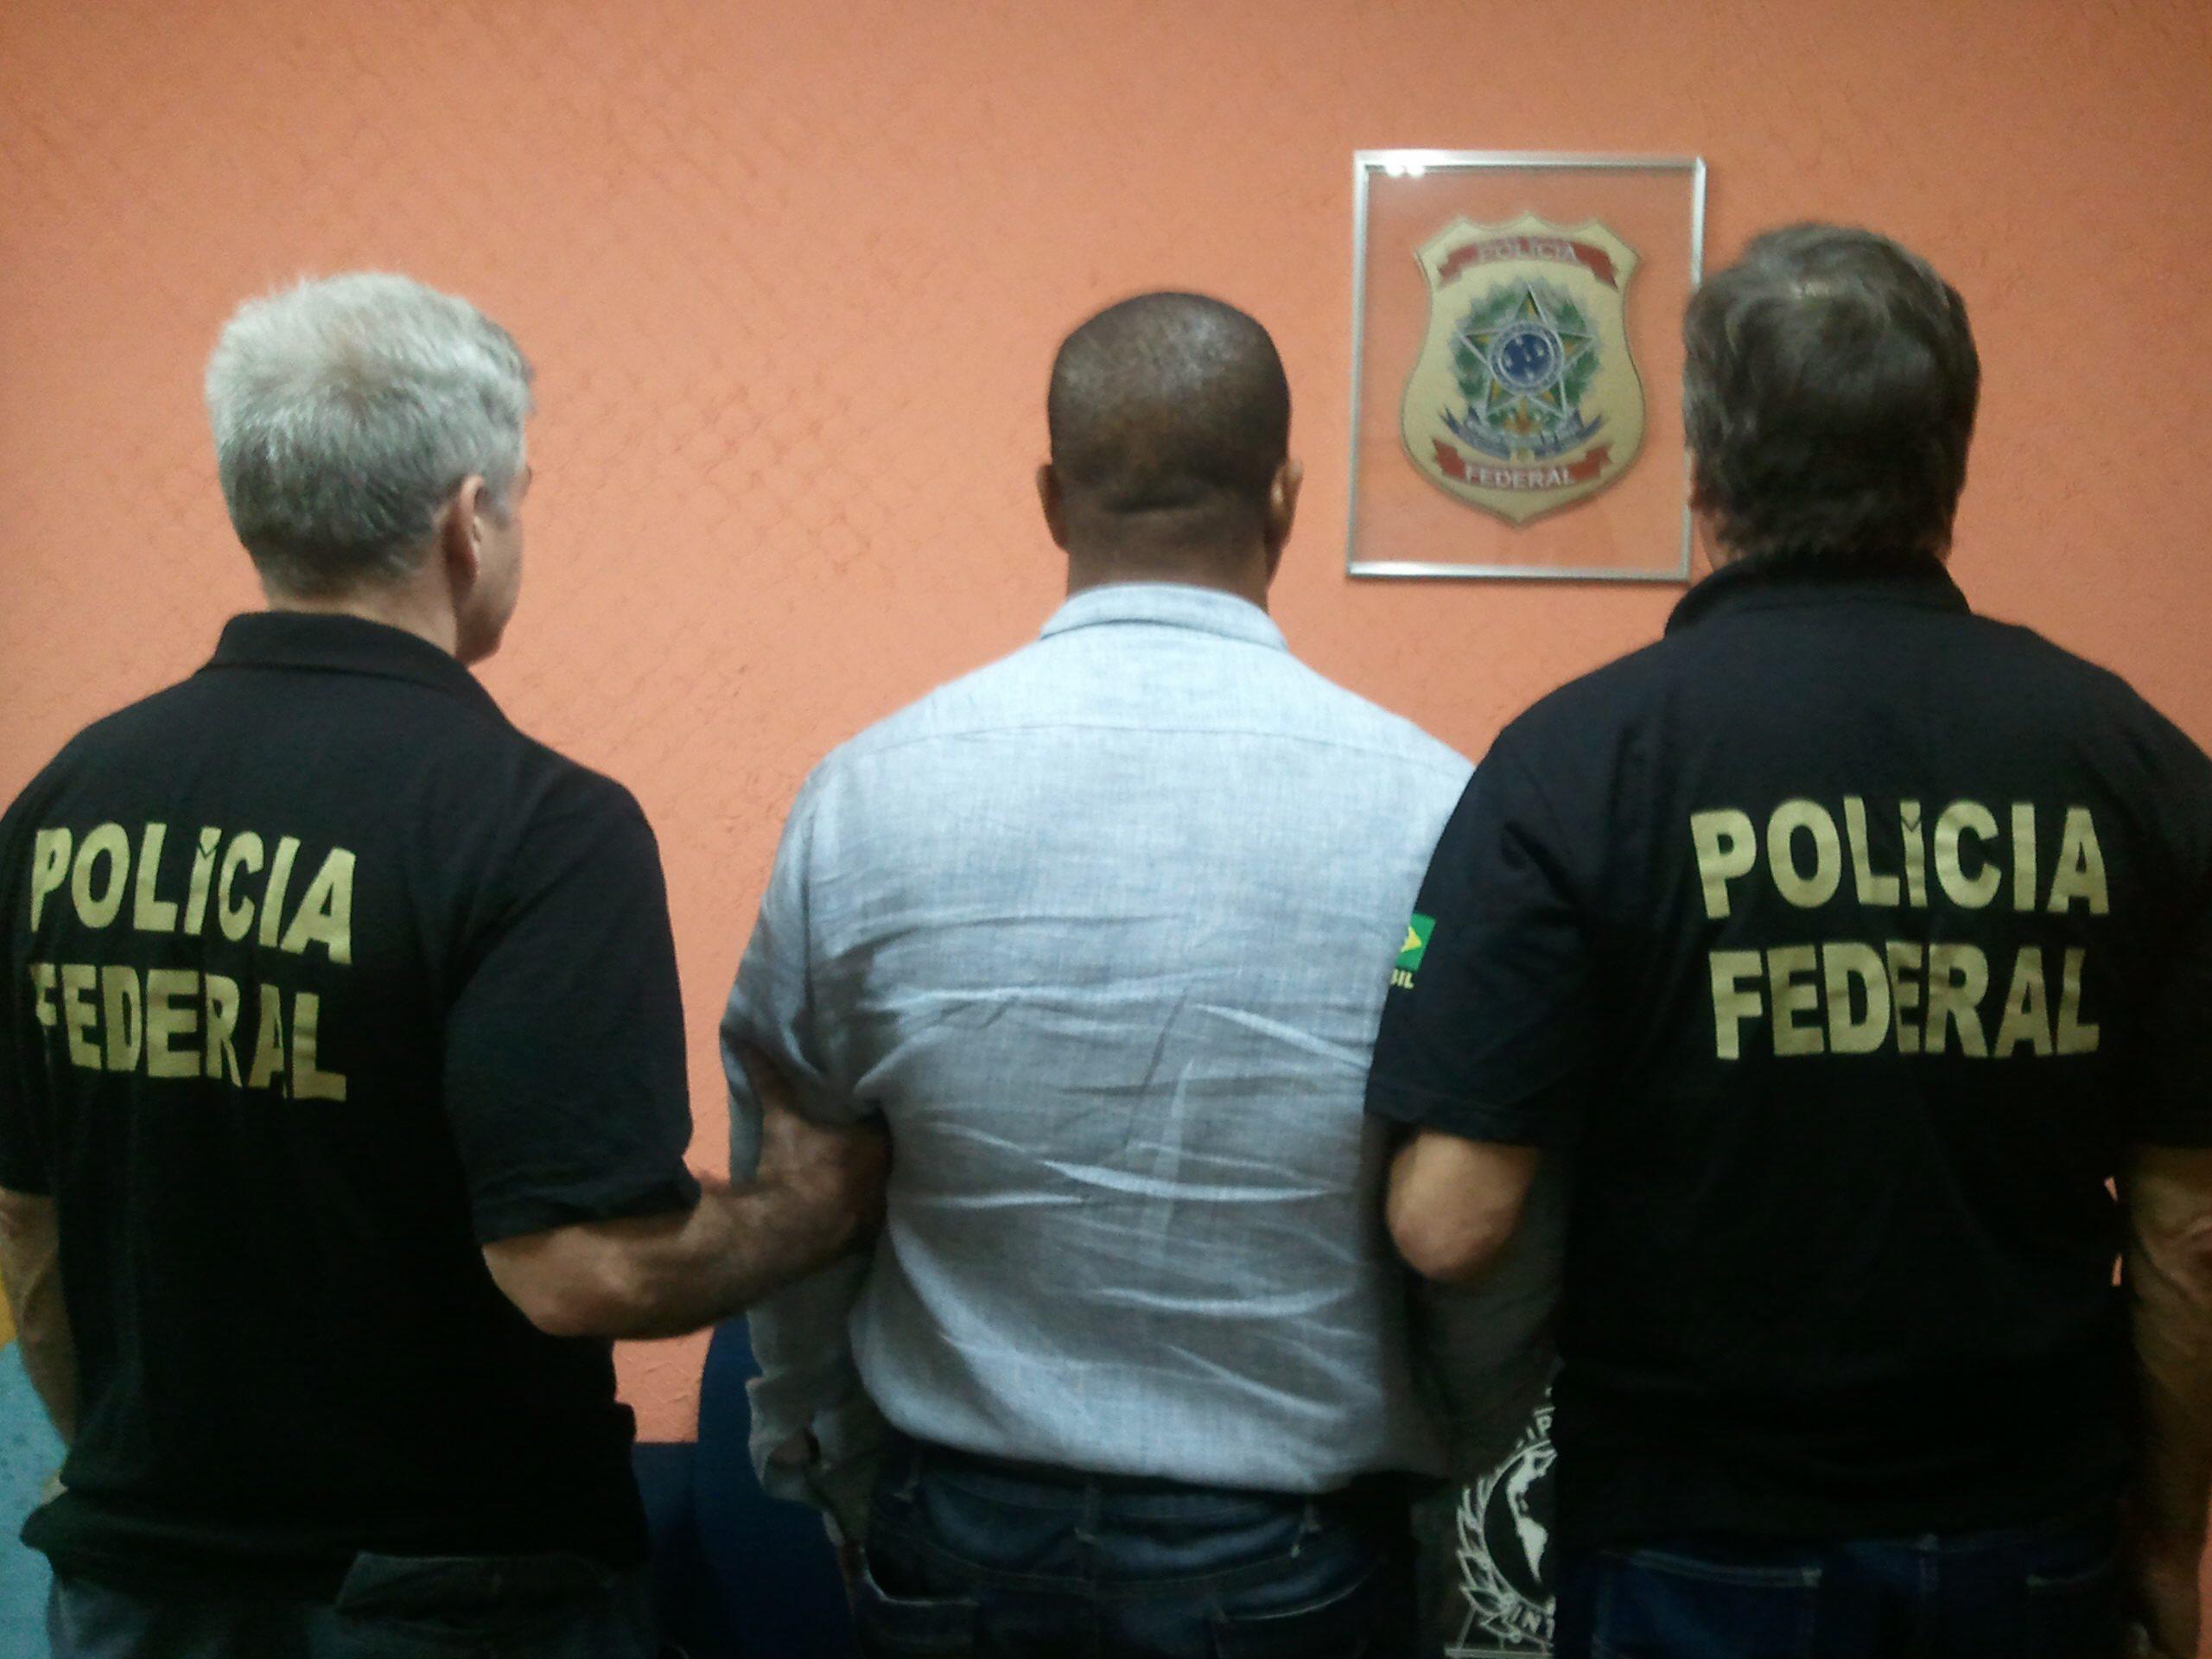 Polícia brasileira desarticula esquema internacional de envio de droga para a Europa